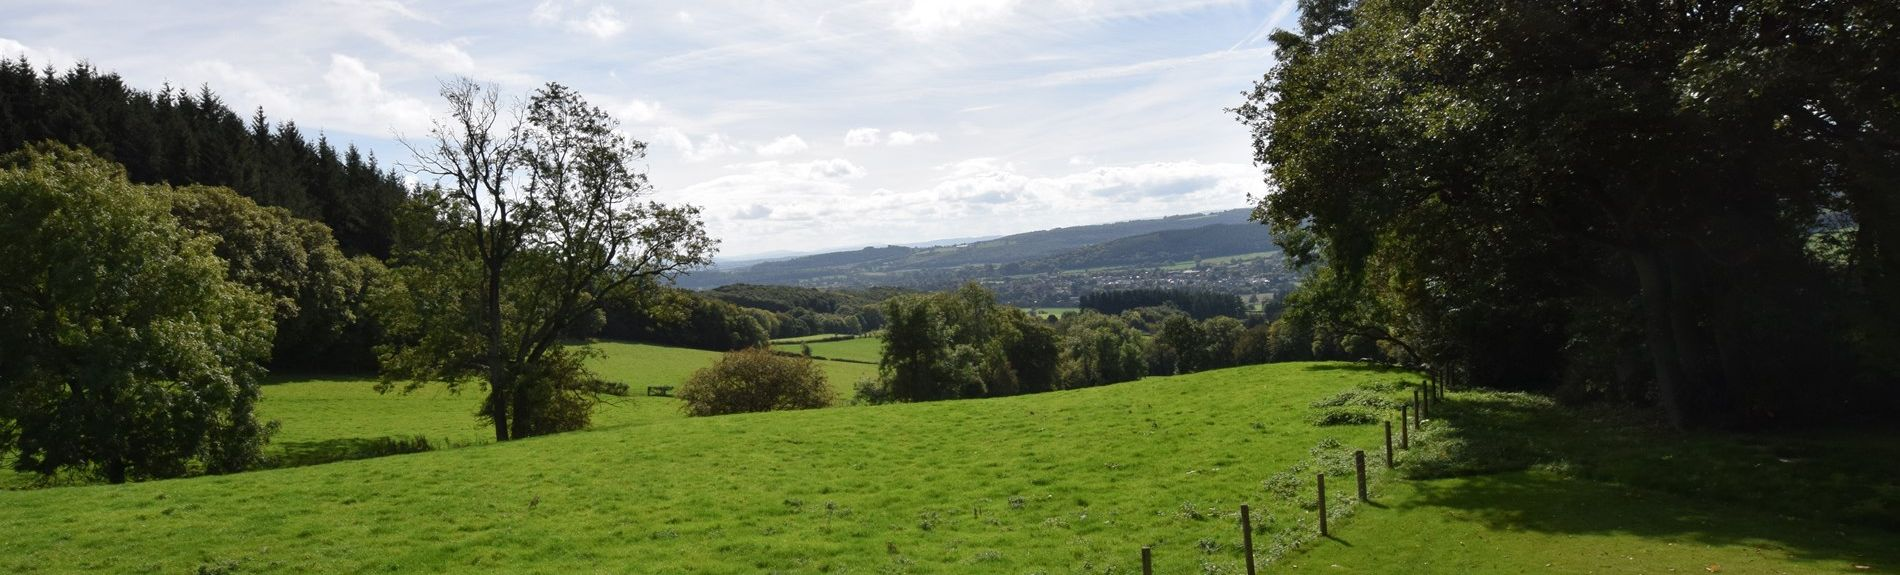 Titley, Herefordshire, UK